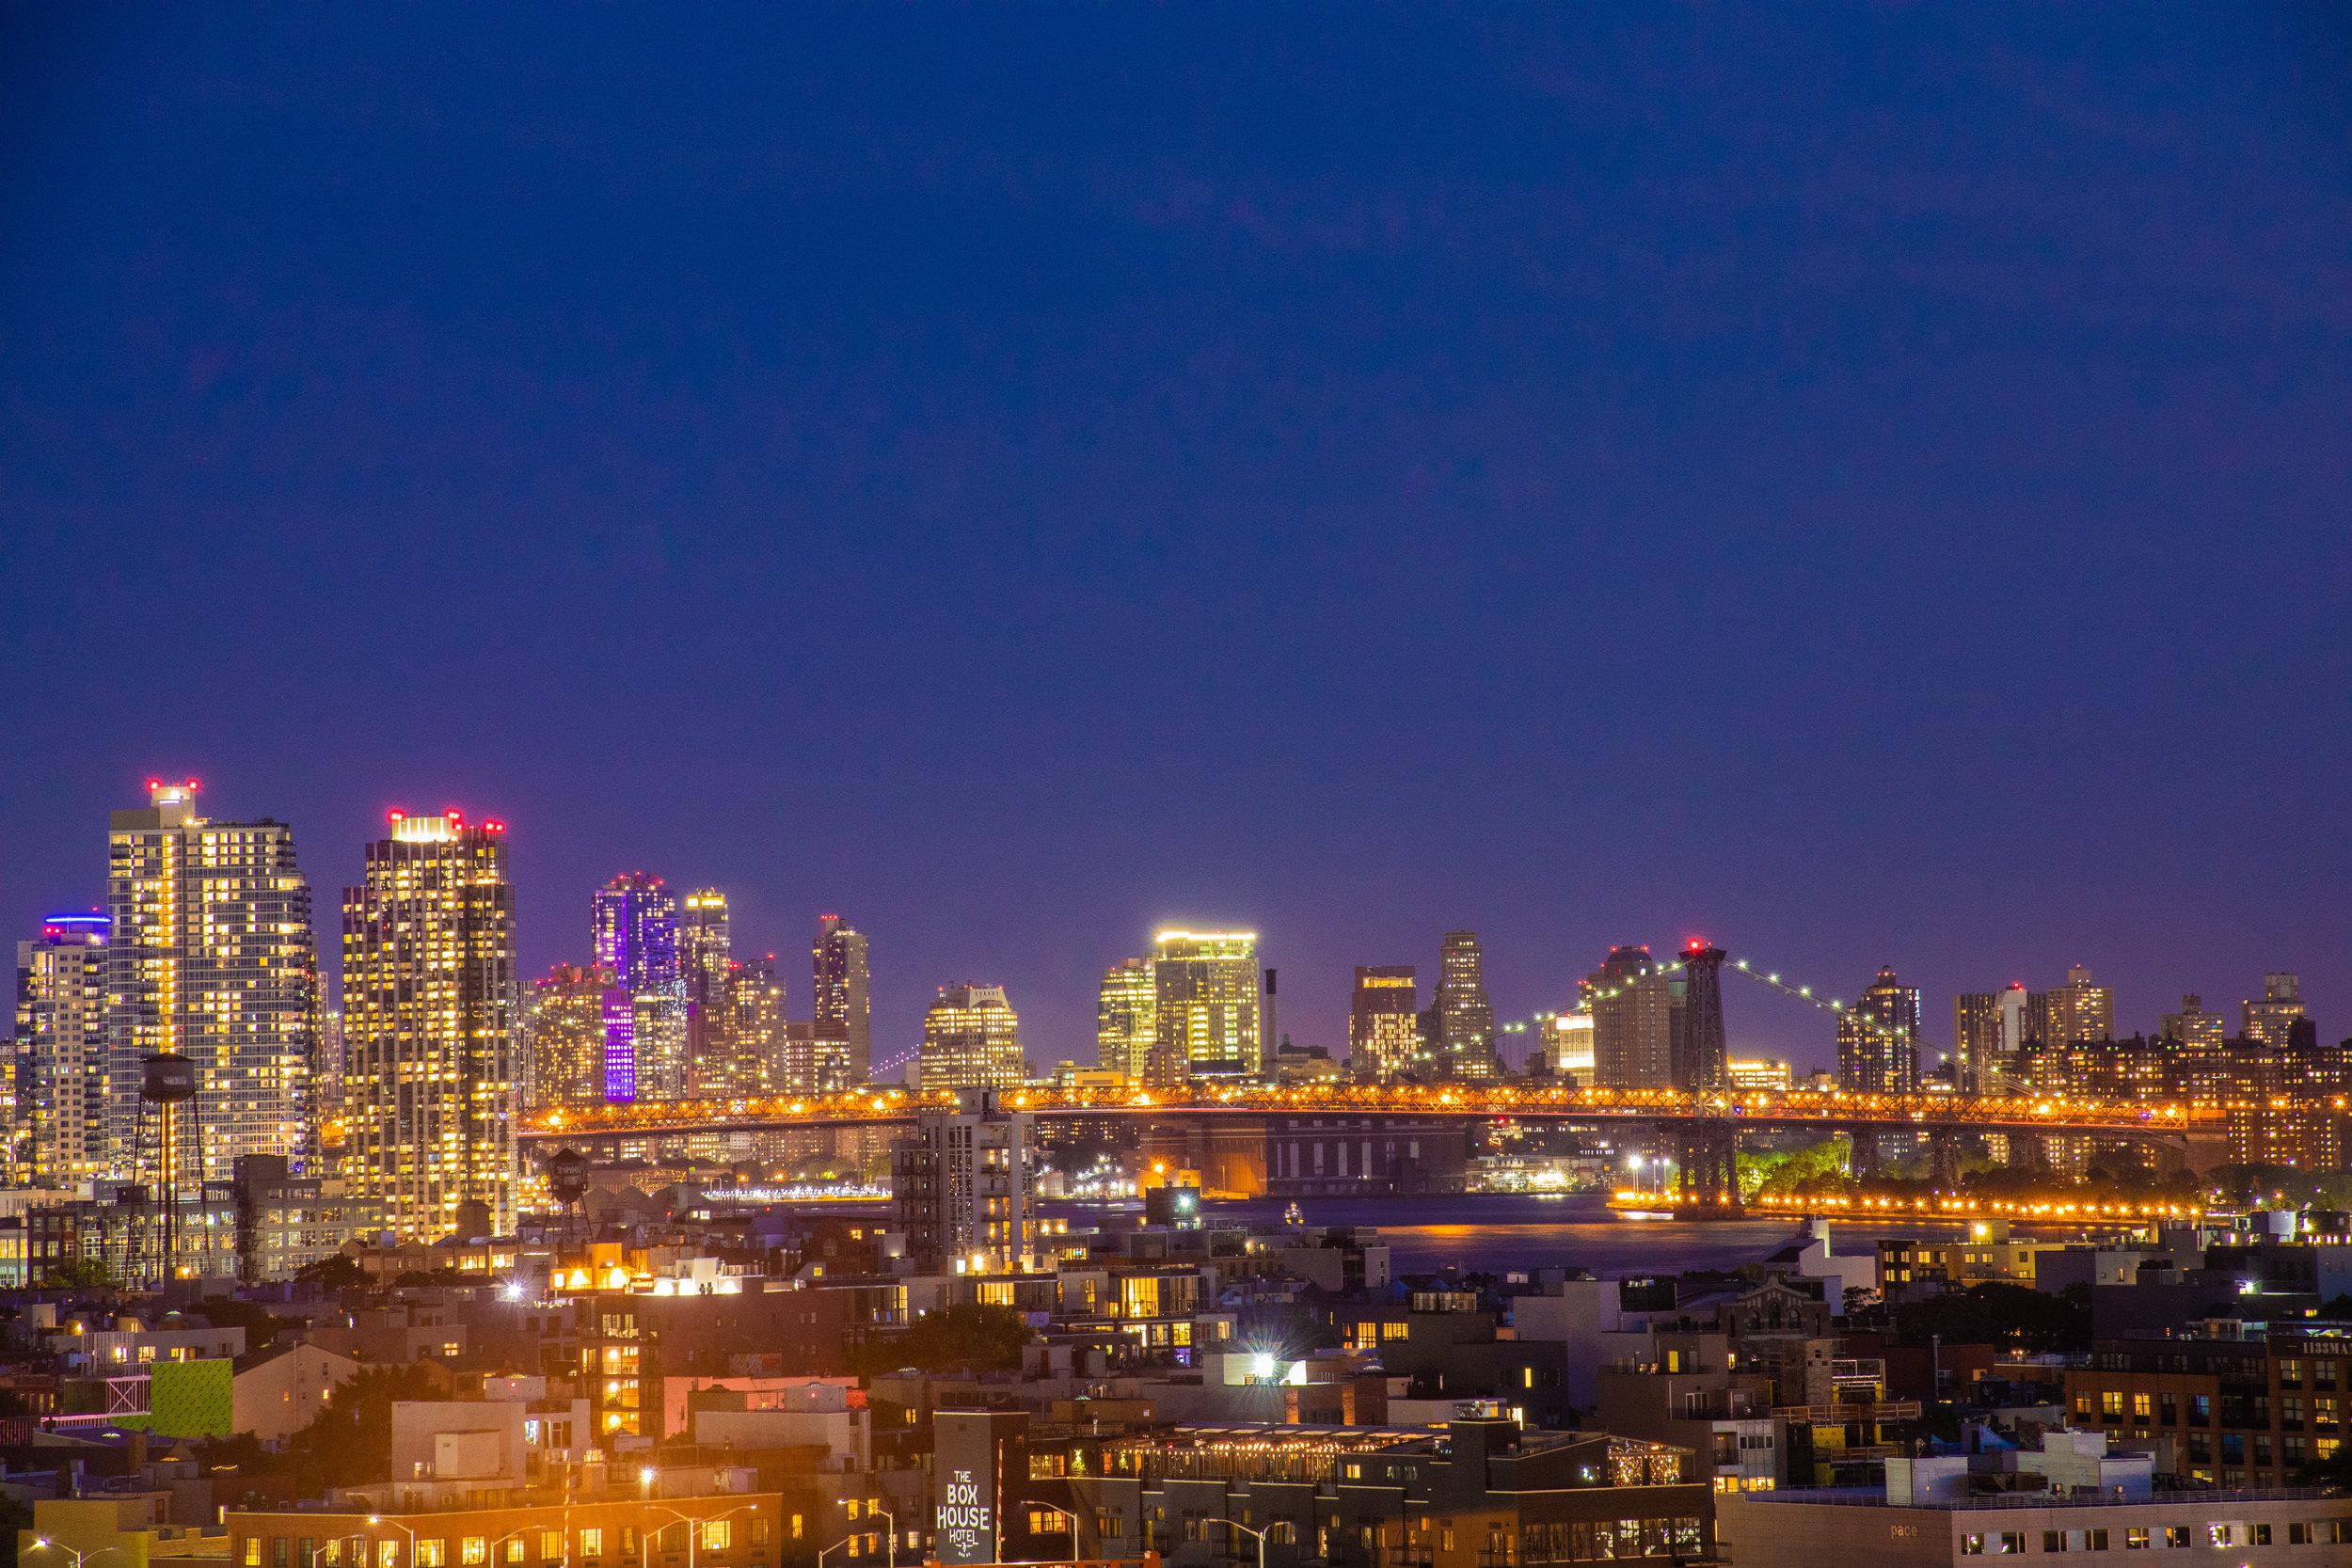 LSNY_Night_City_Views-27.jpg